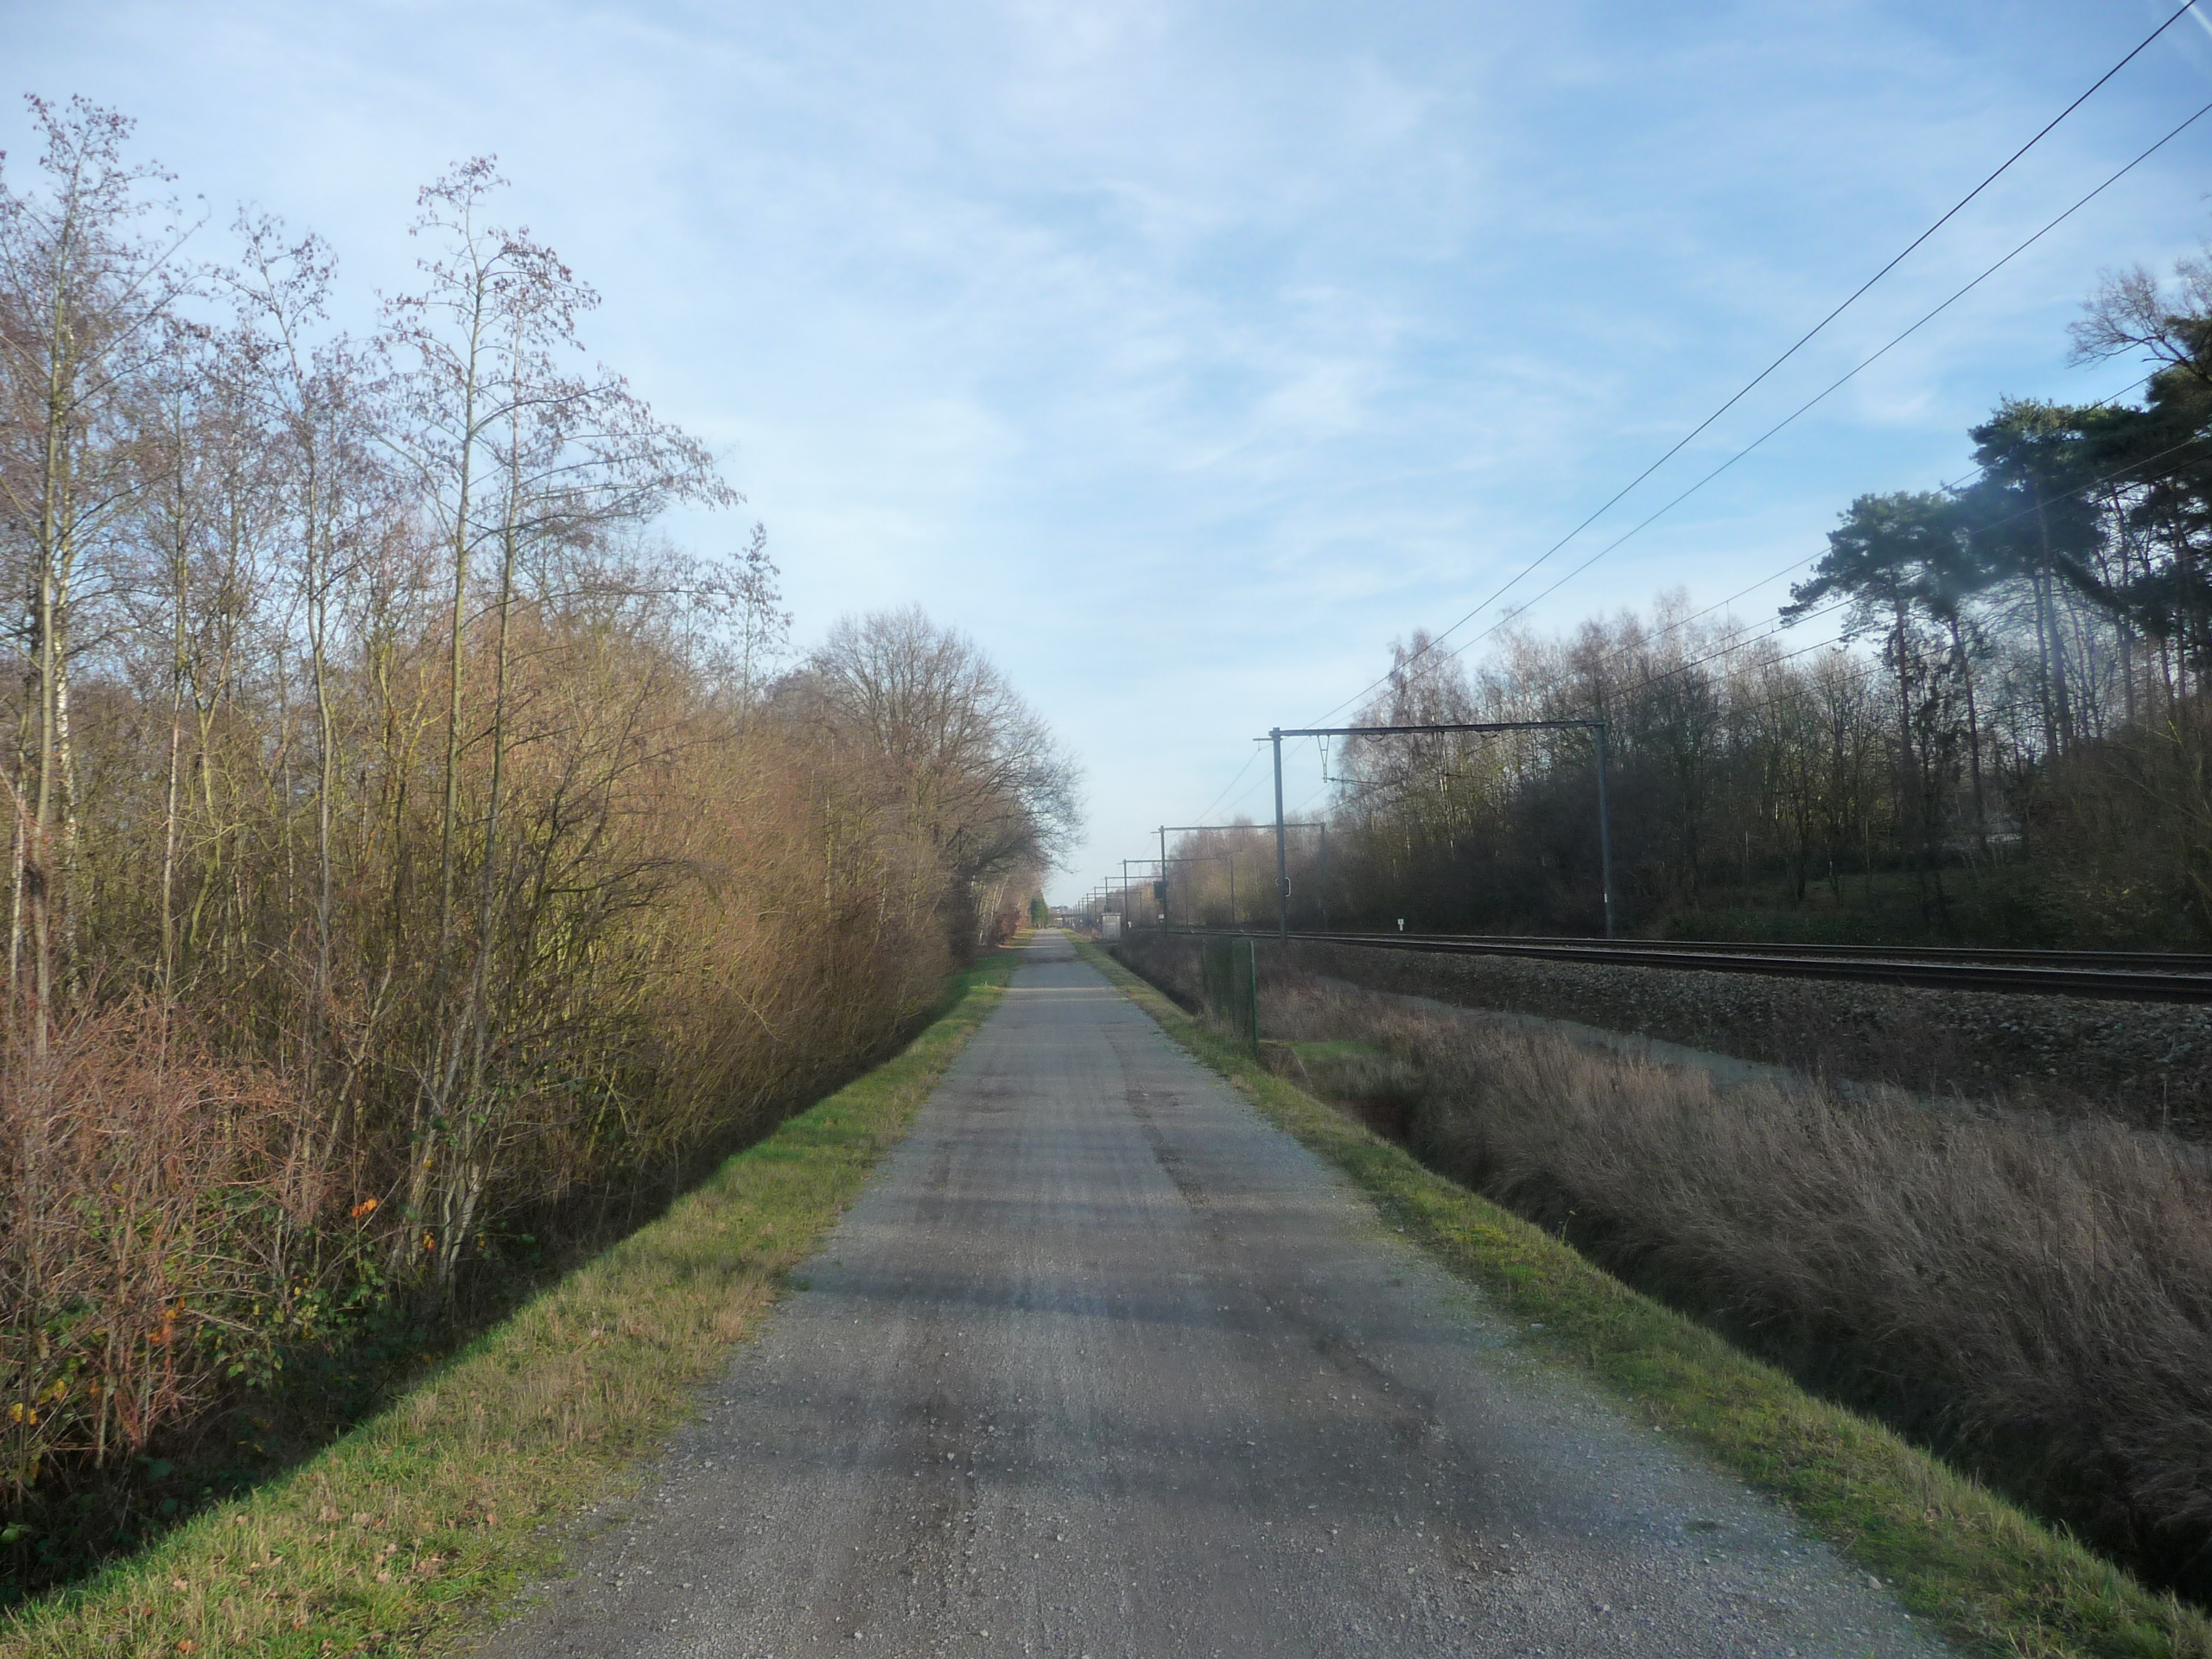 Leuven railway line